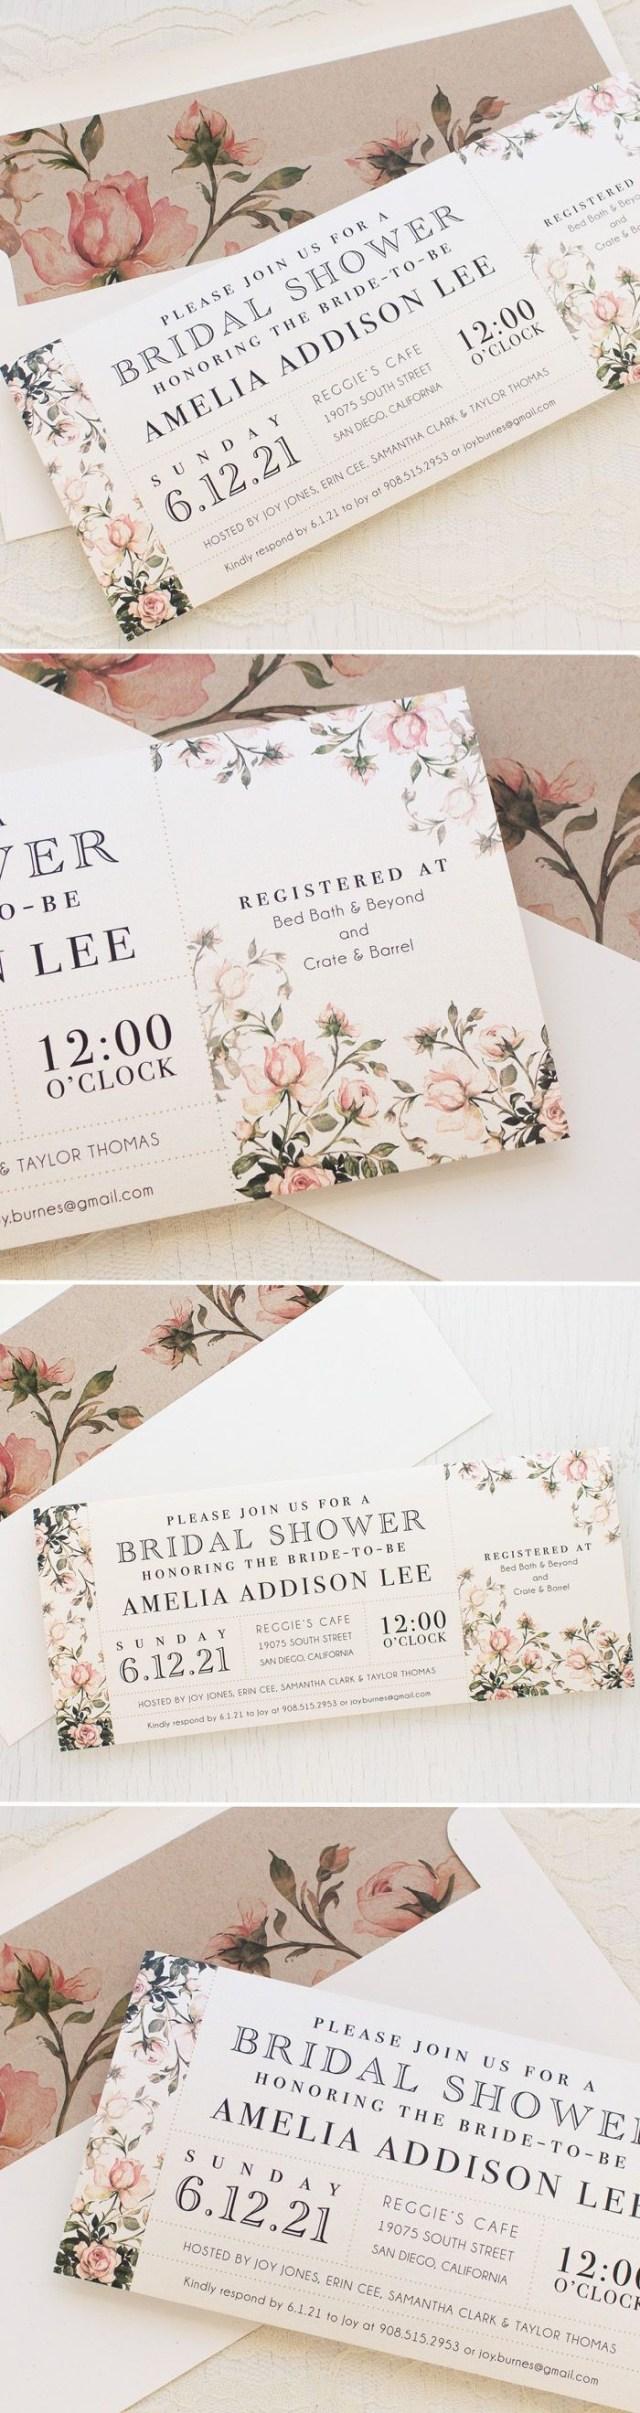 Woodland Wedding Invitations Woodland Wedding Invitations Uk Luxury 59 Best Invitations Images On